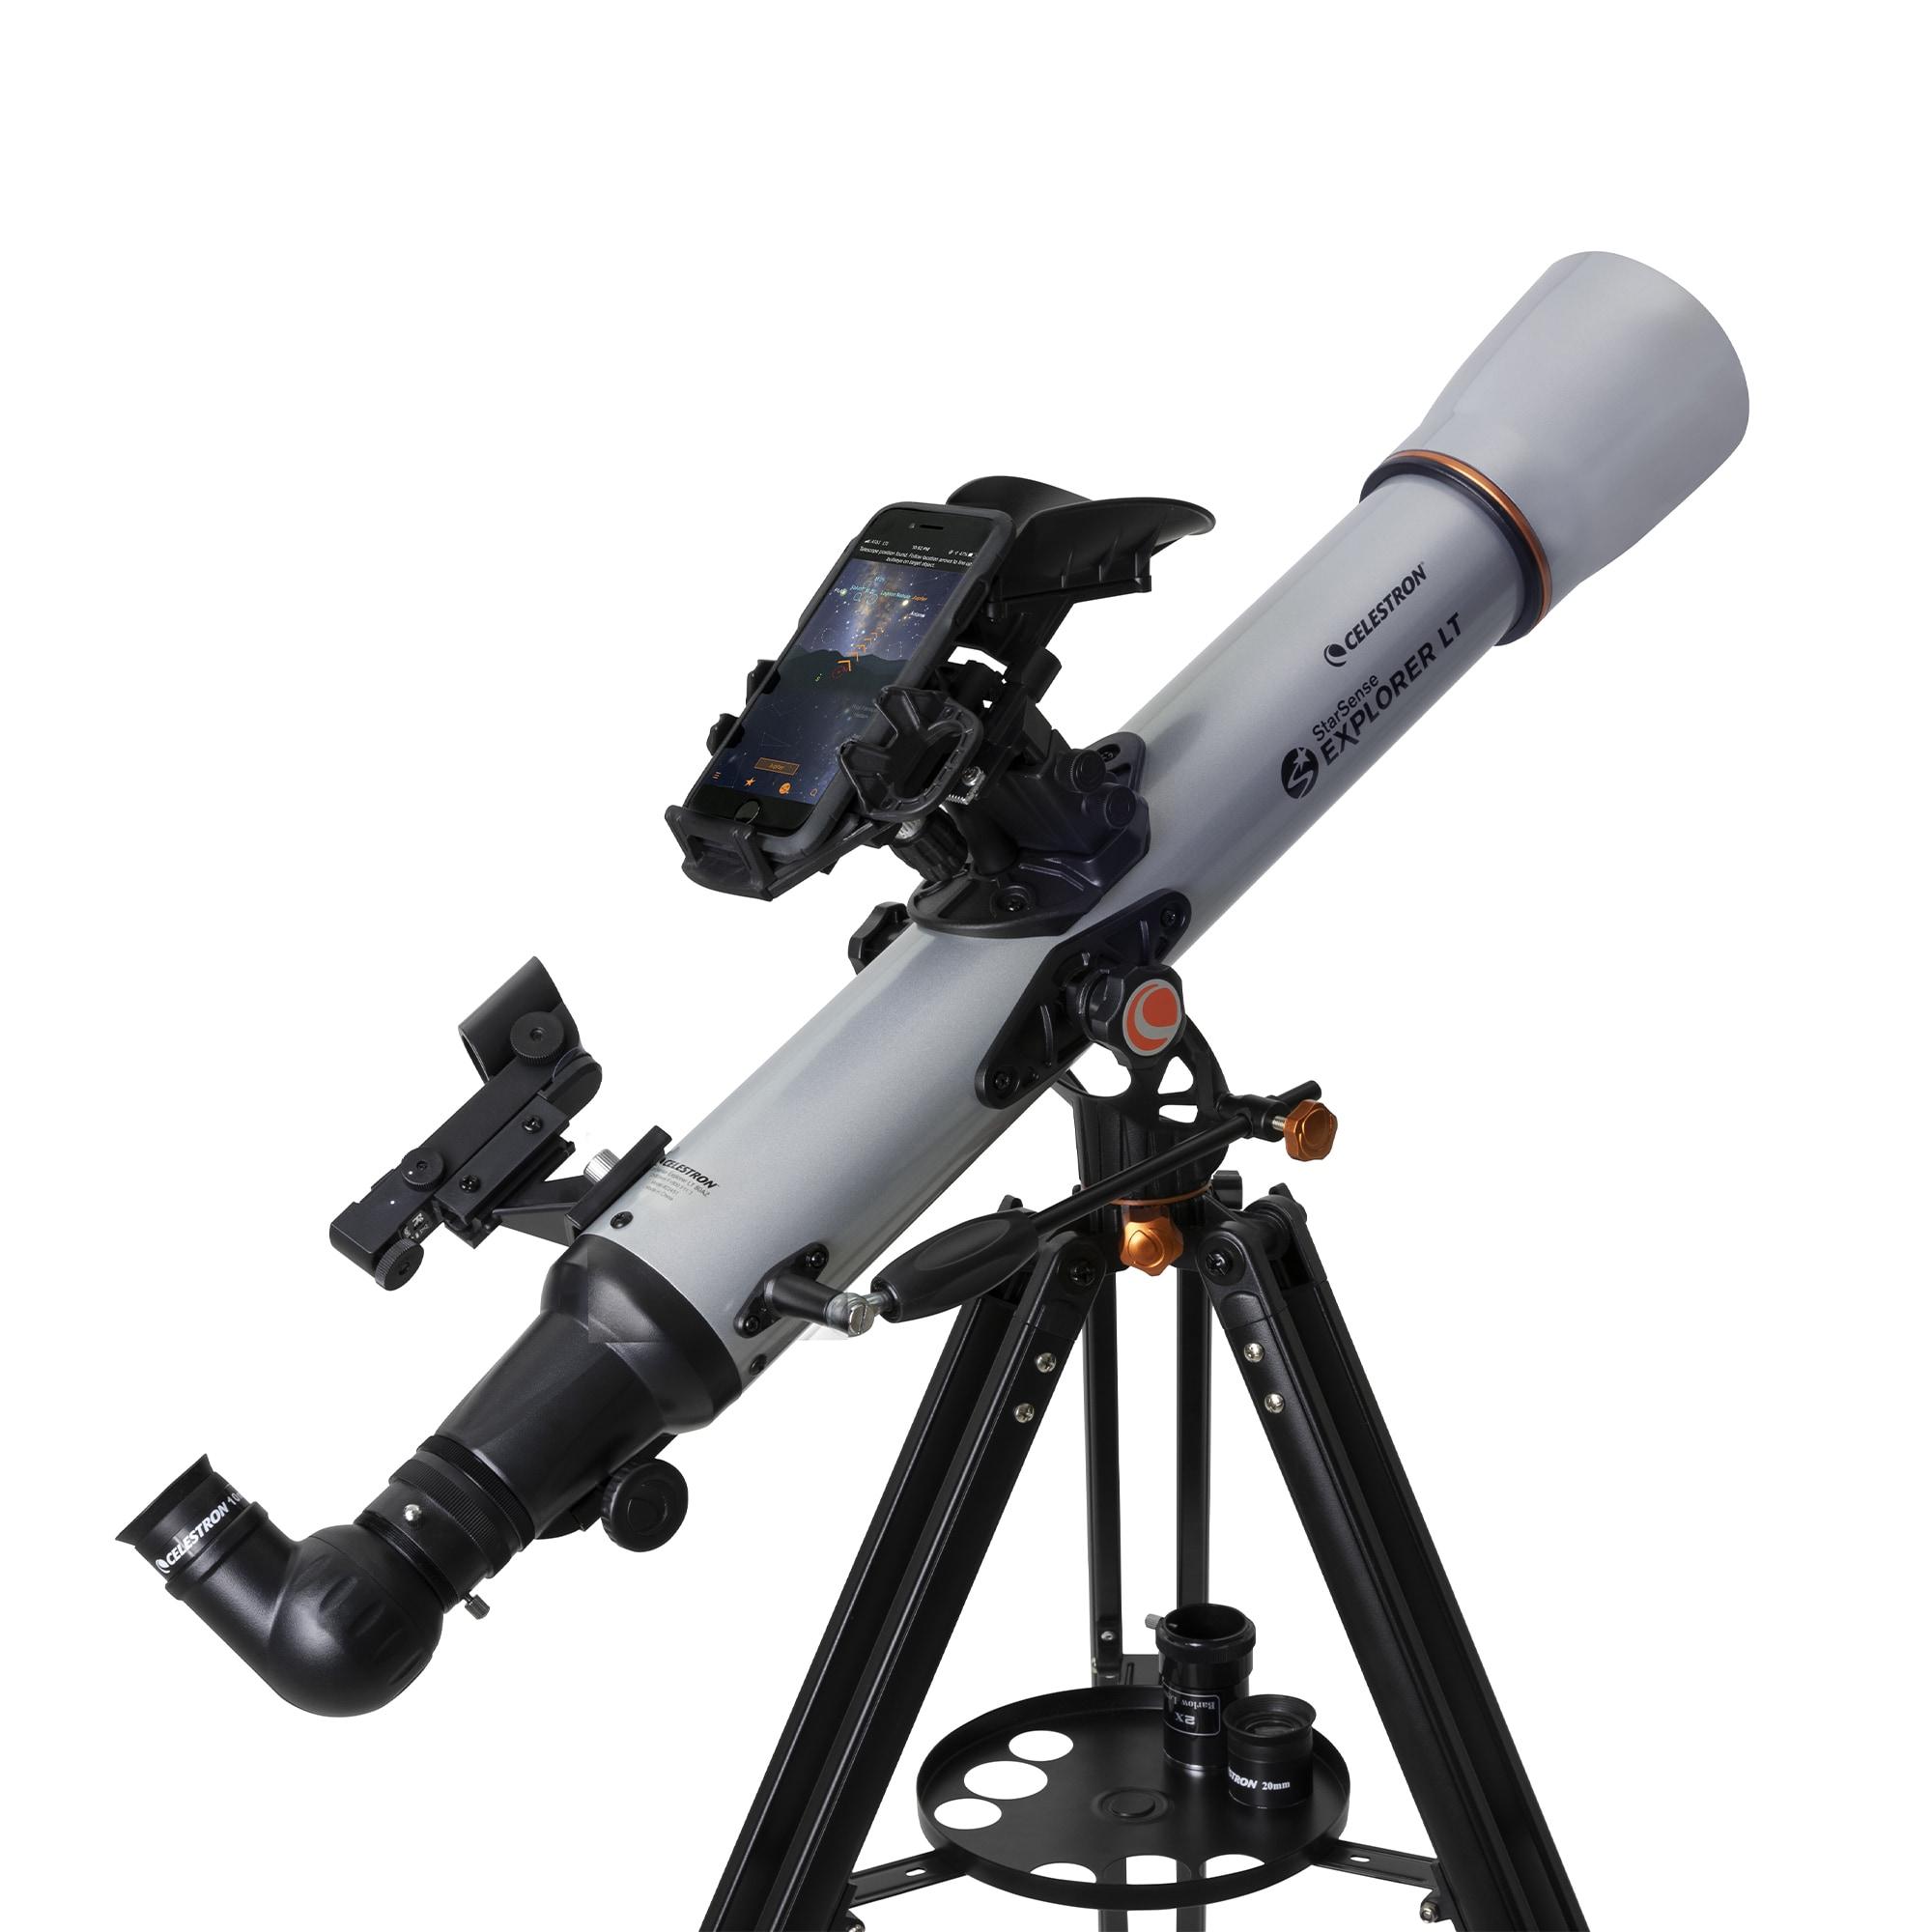 Celestron StarSense Explorer LT80AZ